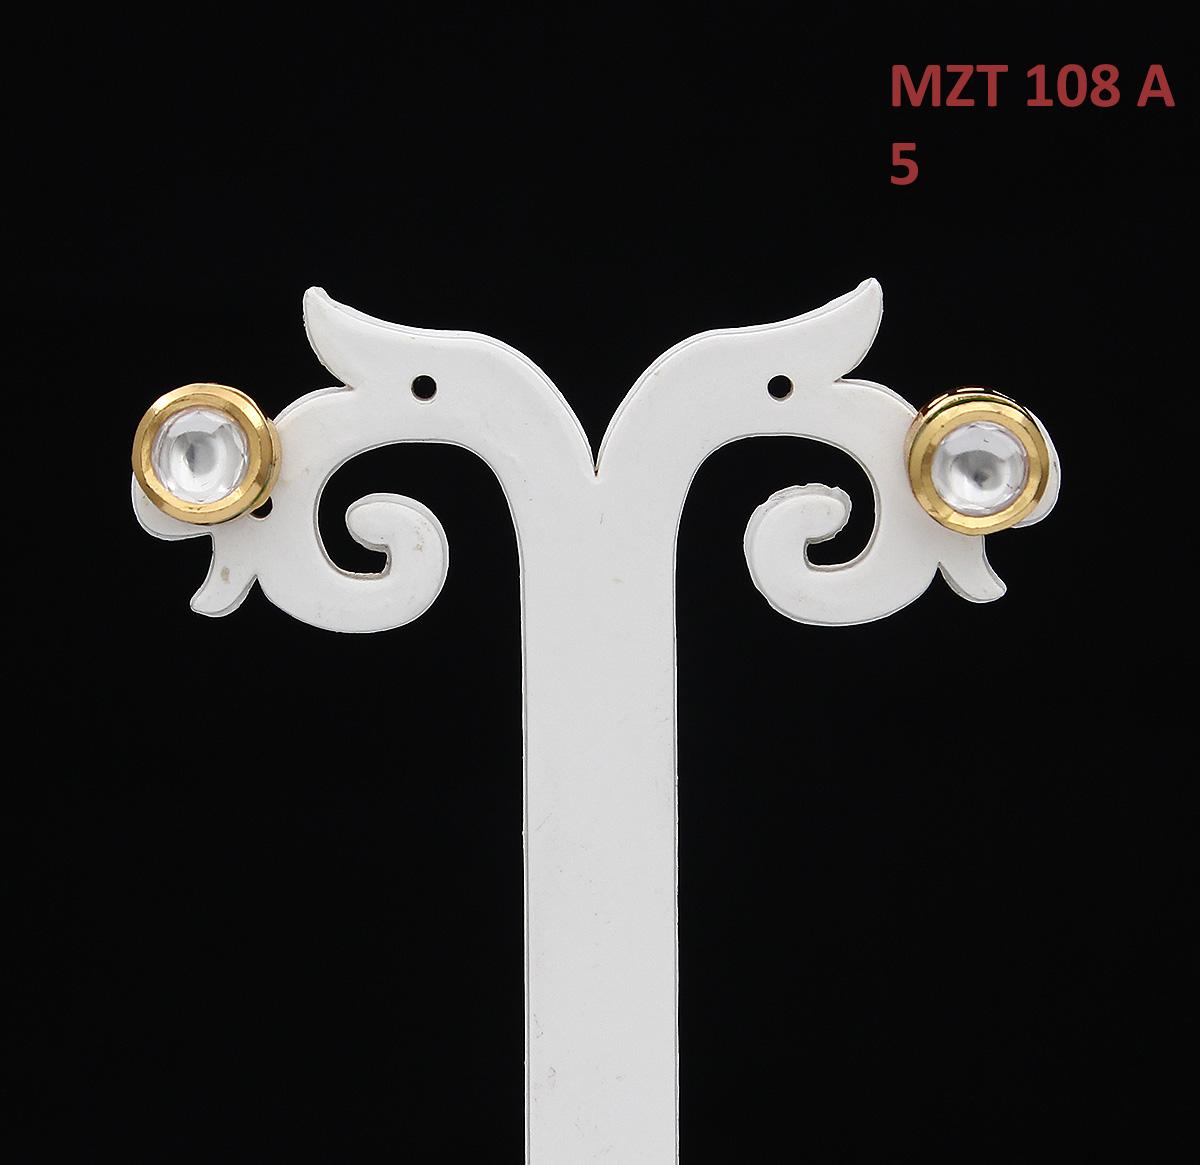 55Carat   55Carat Classic Stud Earrings Gold Plated Round Shape Kundan Stone Handcrafted Designer Fashion Jewellery for Women Girls